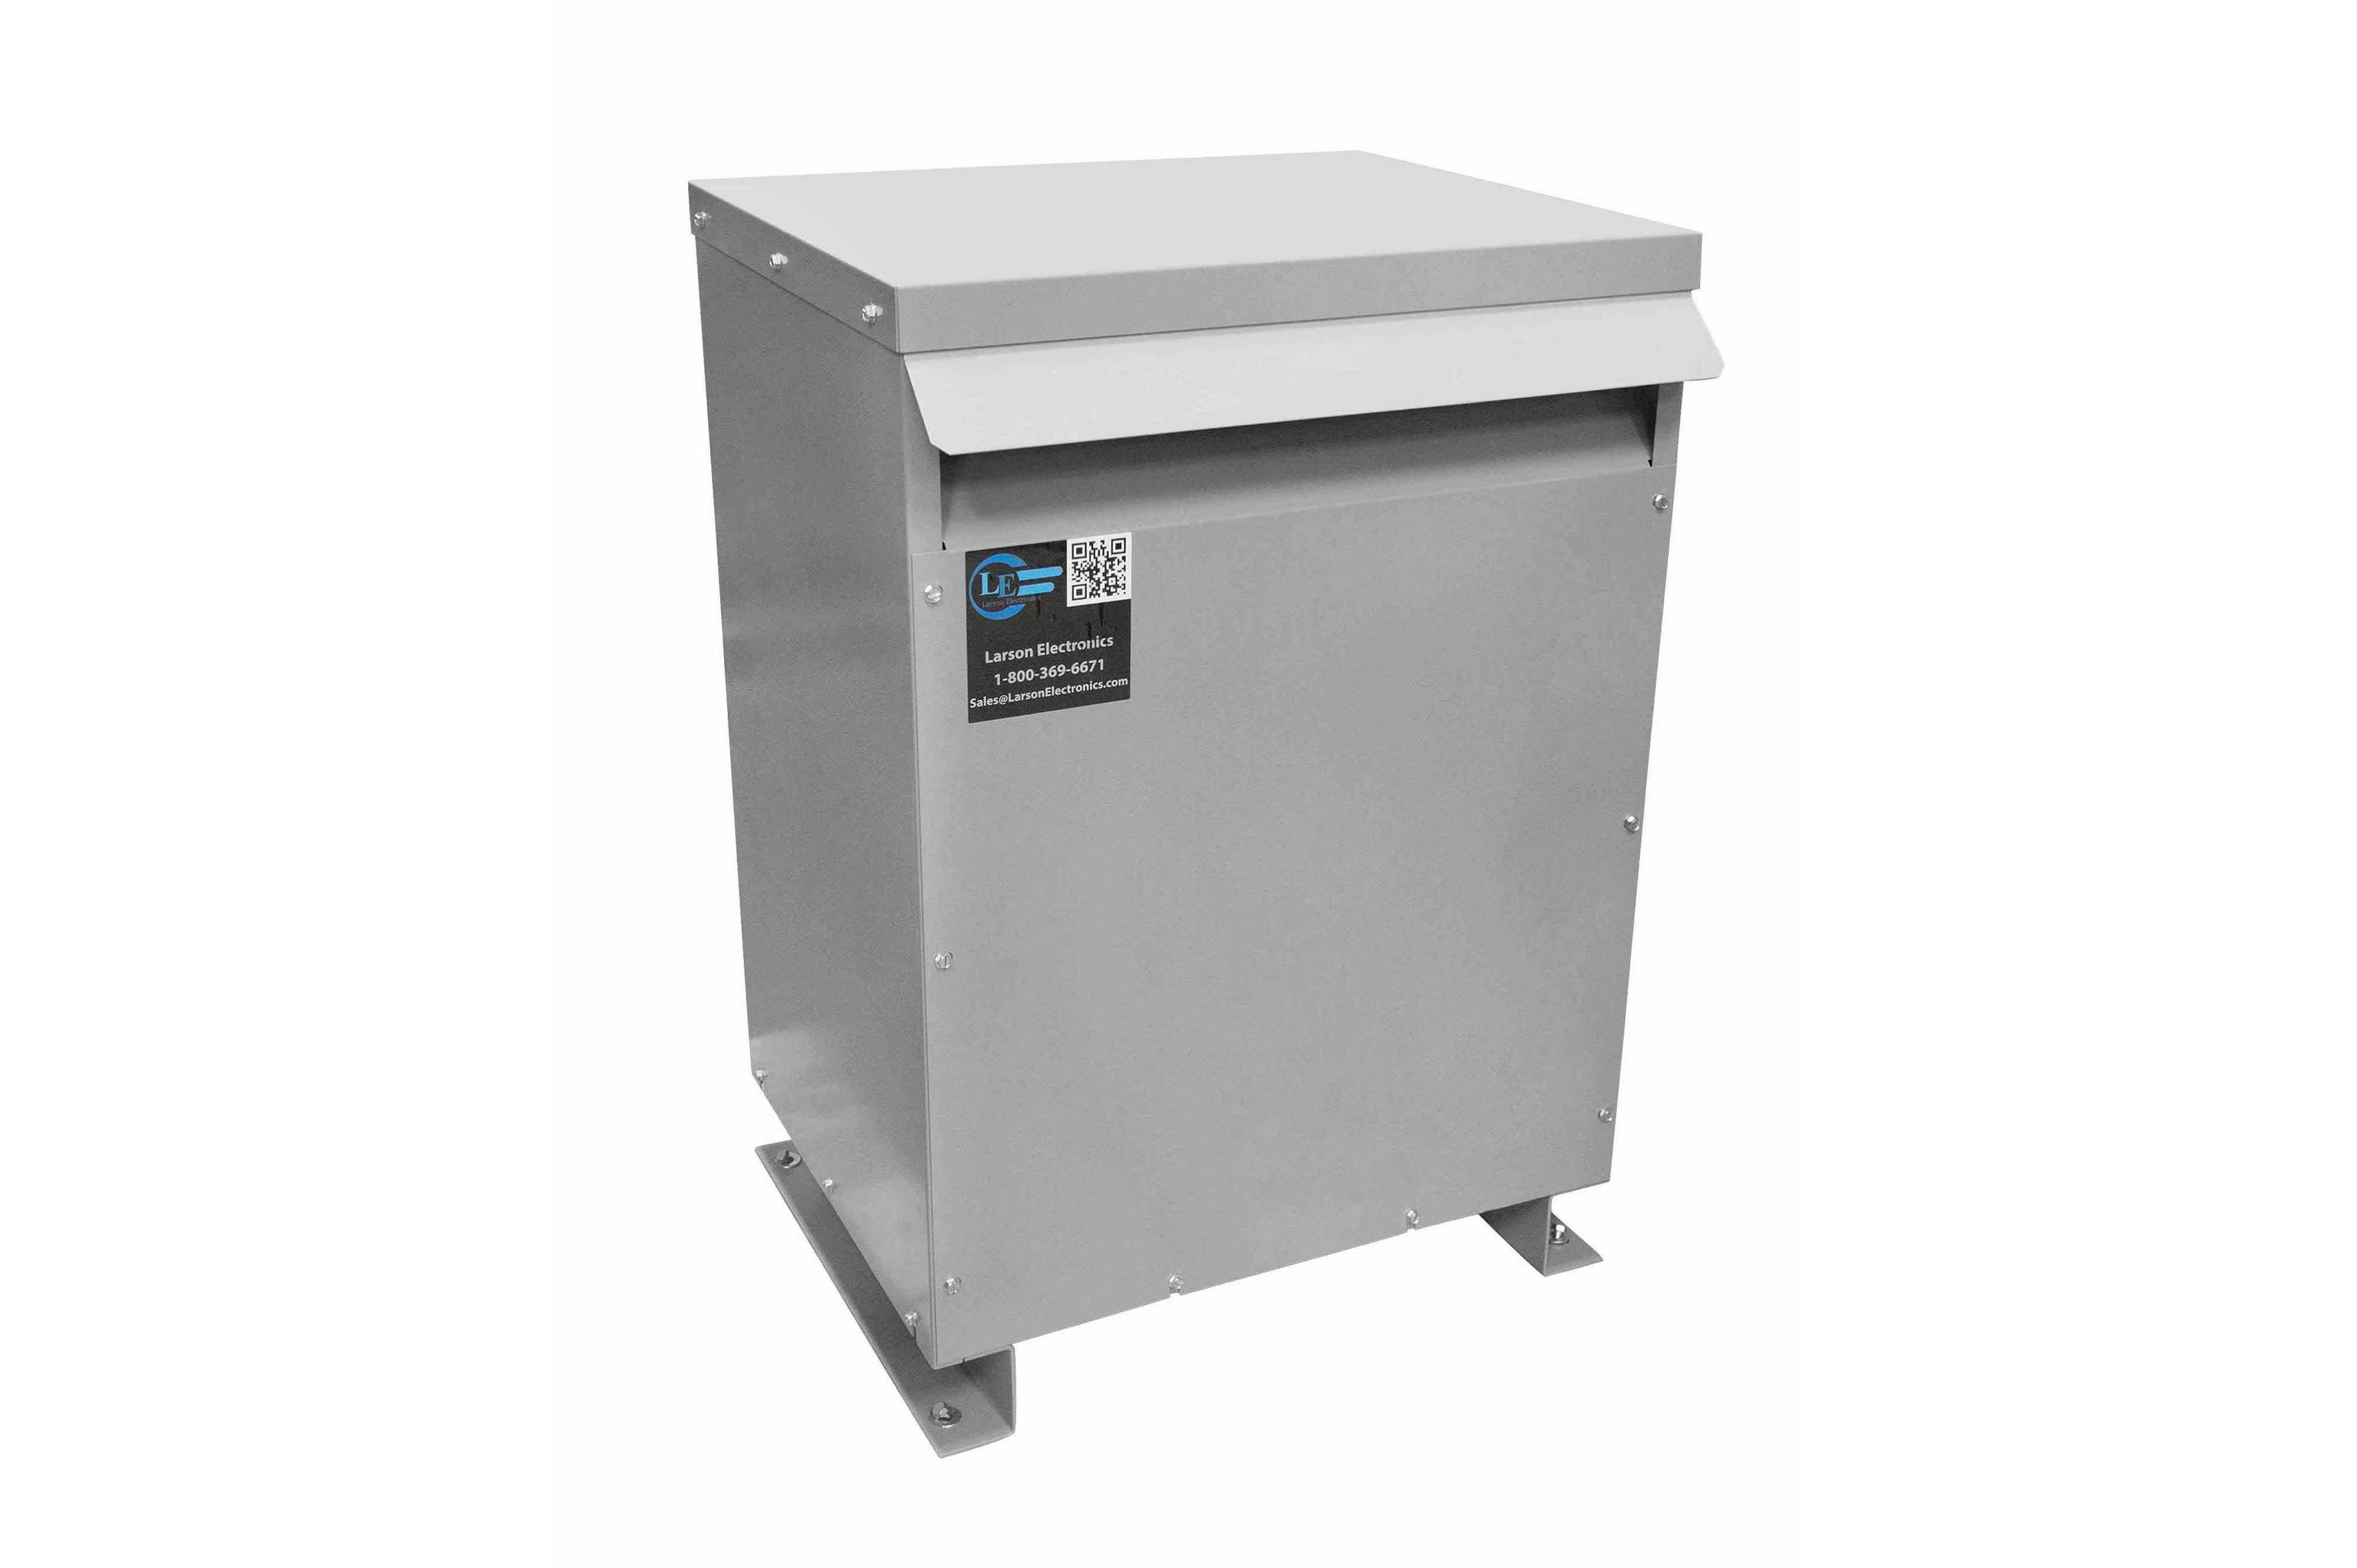 10 kVA 3PH Isolation Transformer, 230V Wye Primary, 480V Delta Secondary, N3R, Ventilated, 60 Hz